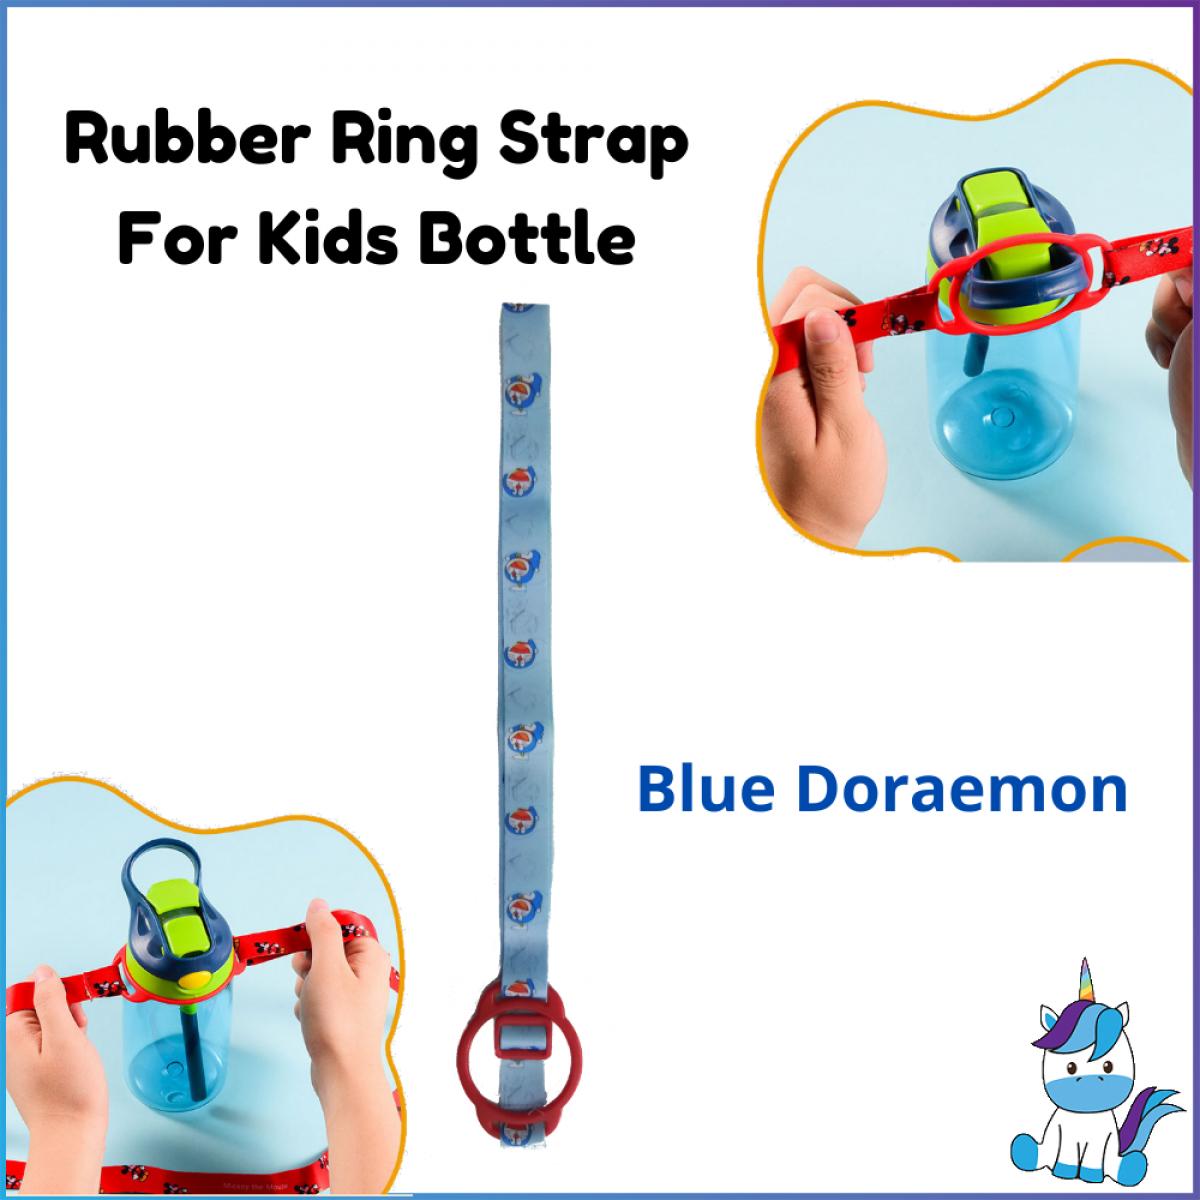 Rubber Ring Kids Bottle Strap - Suitable For Many Types of Kids Bottles - Stretchable Ring - Adjustable Length